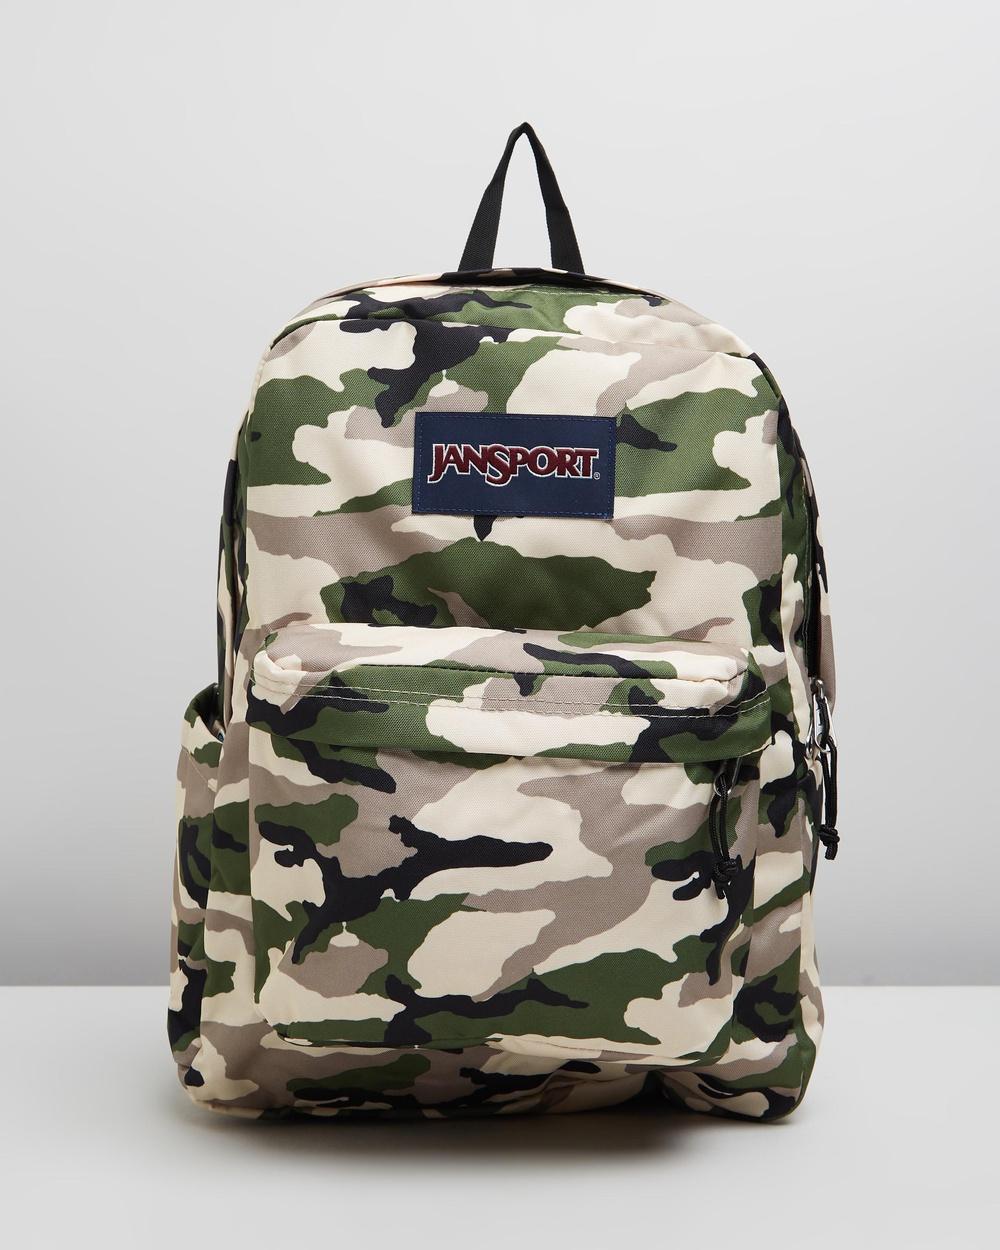 JanSport Backpack Camo Brand New